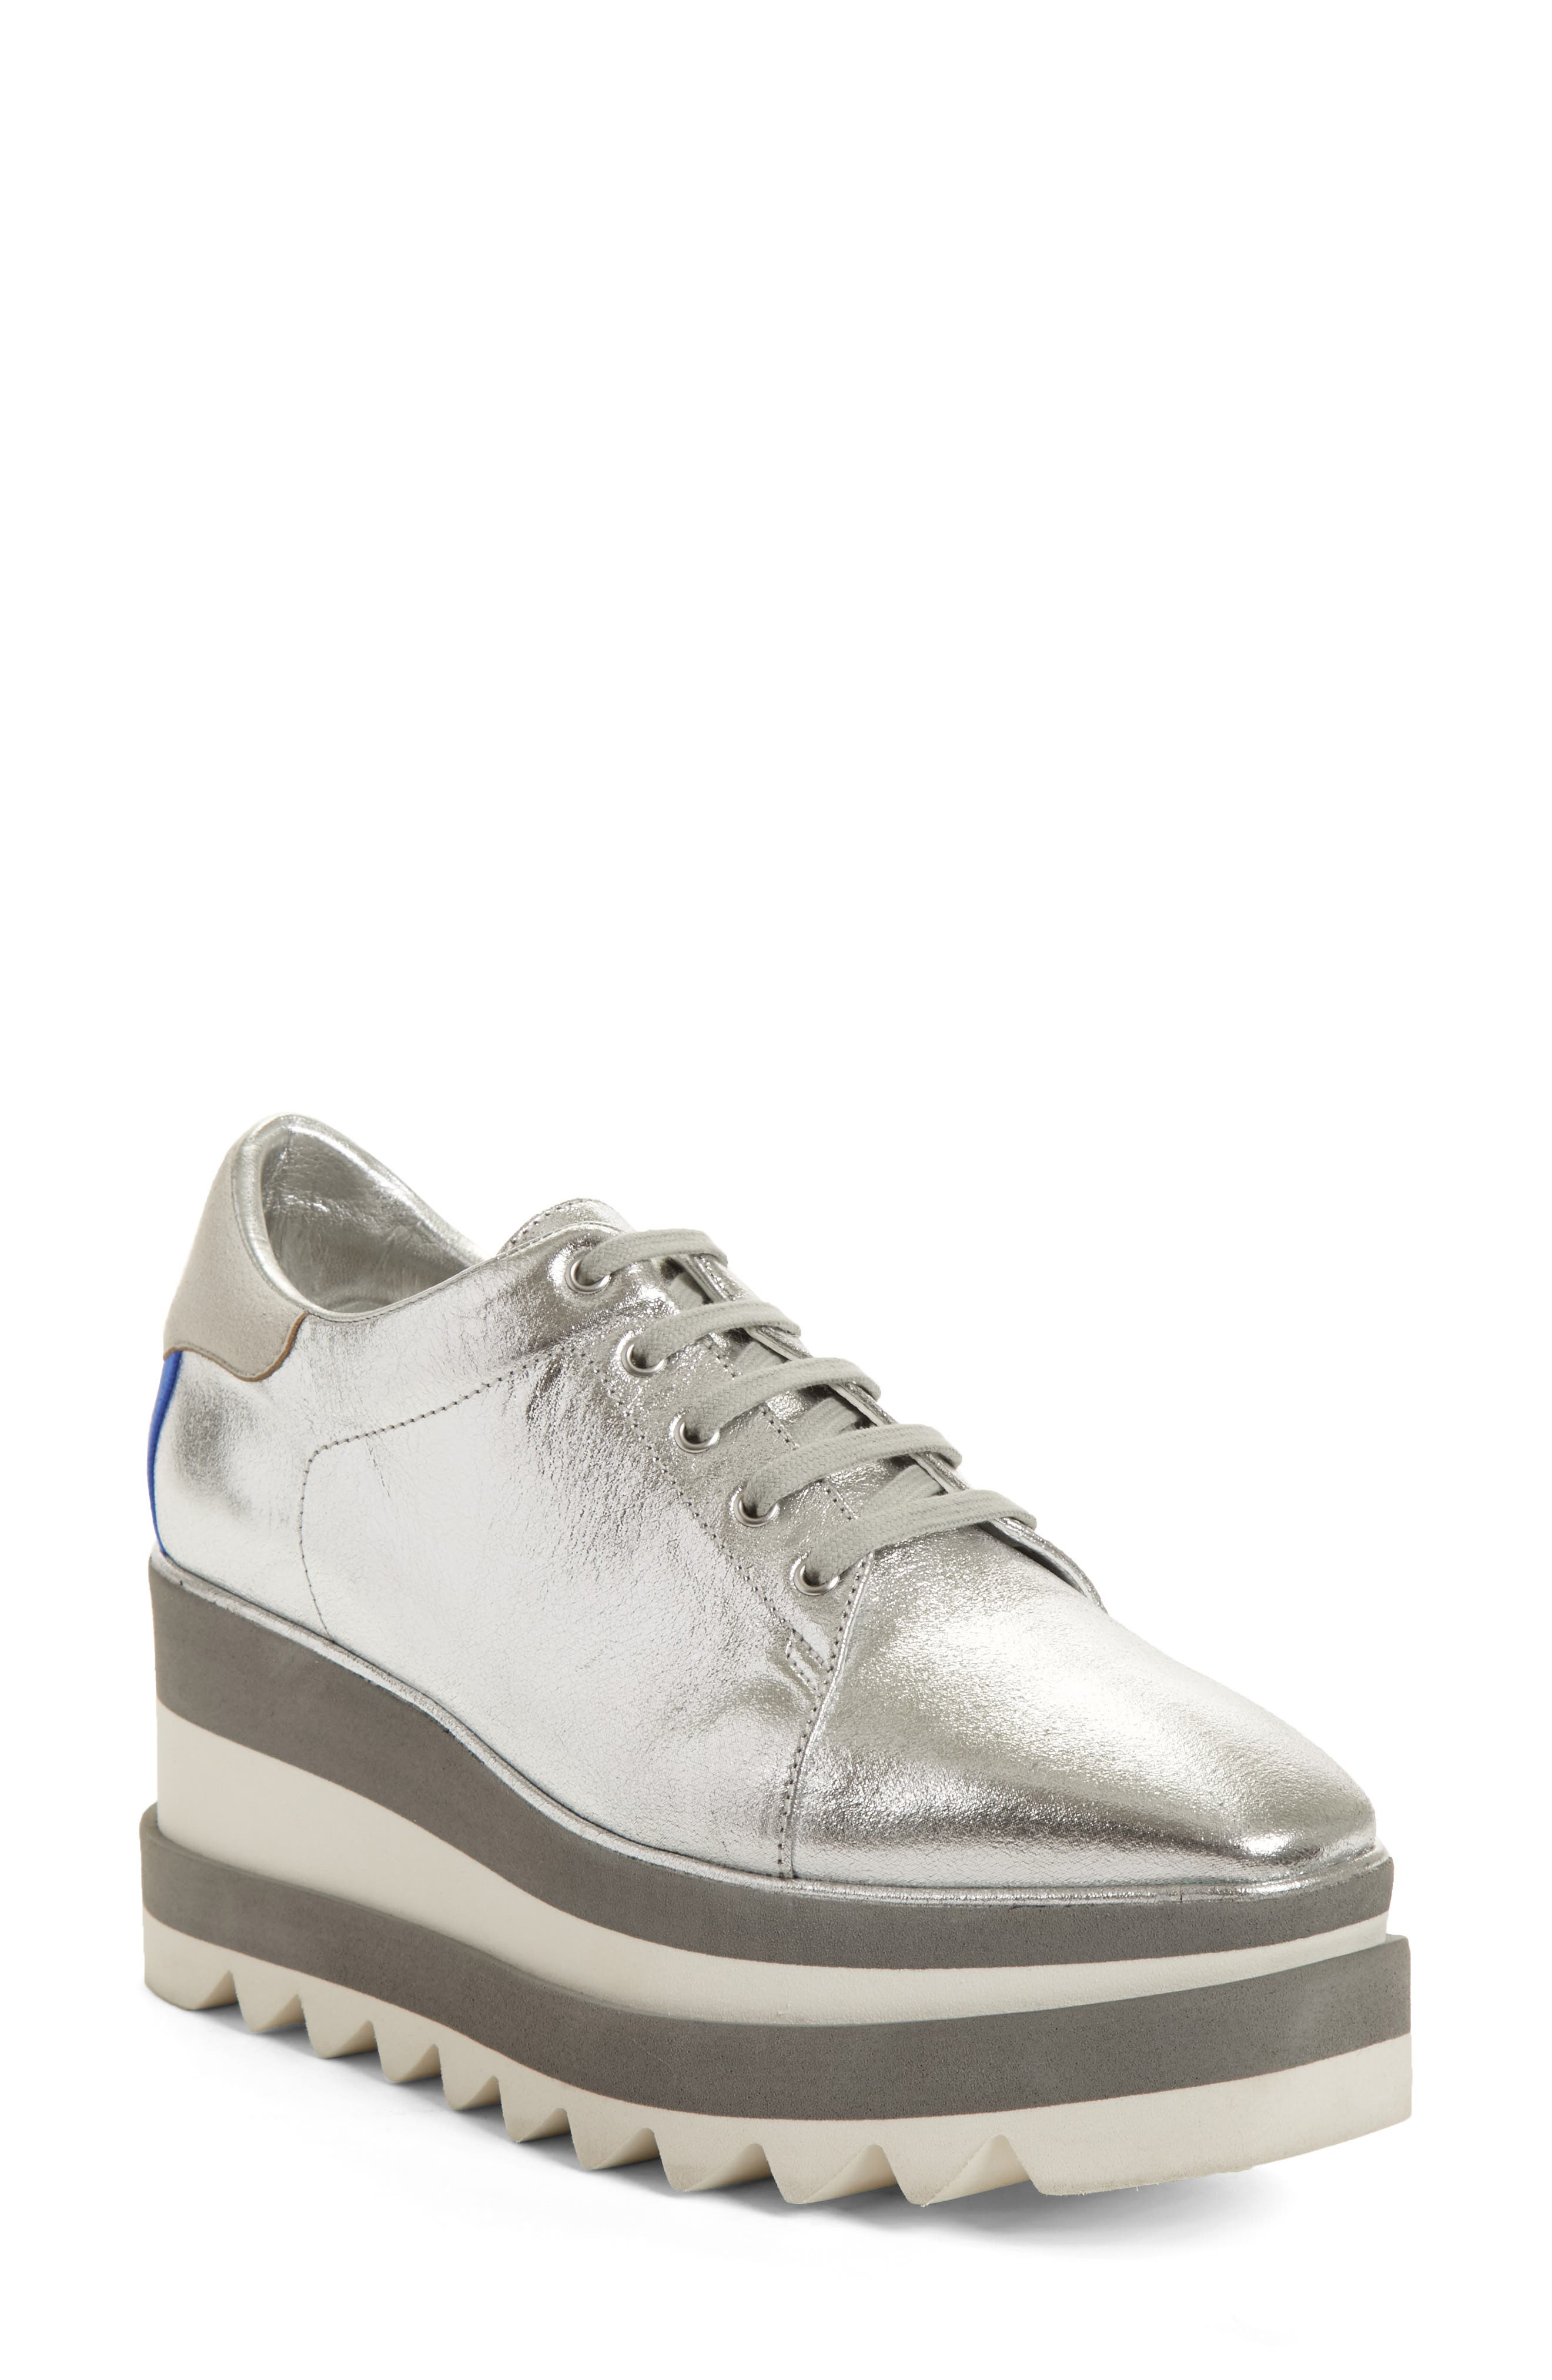 Elyse Platform Sneaker,                         Main,                         color, Silver